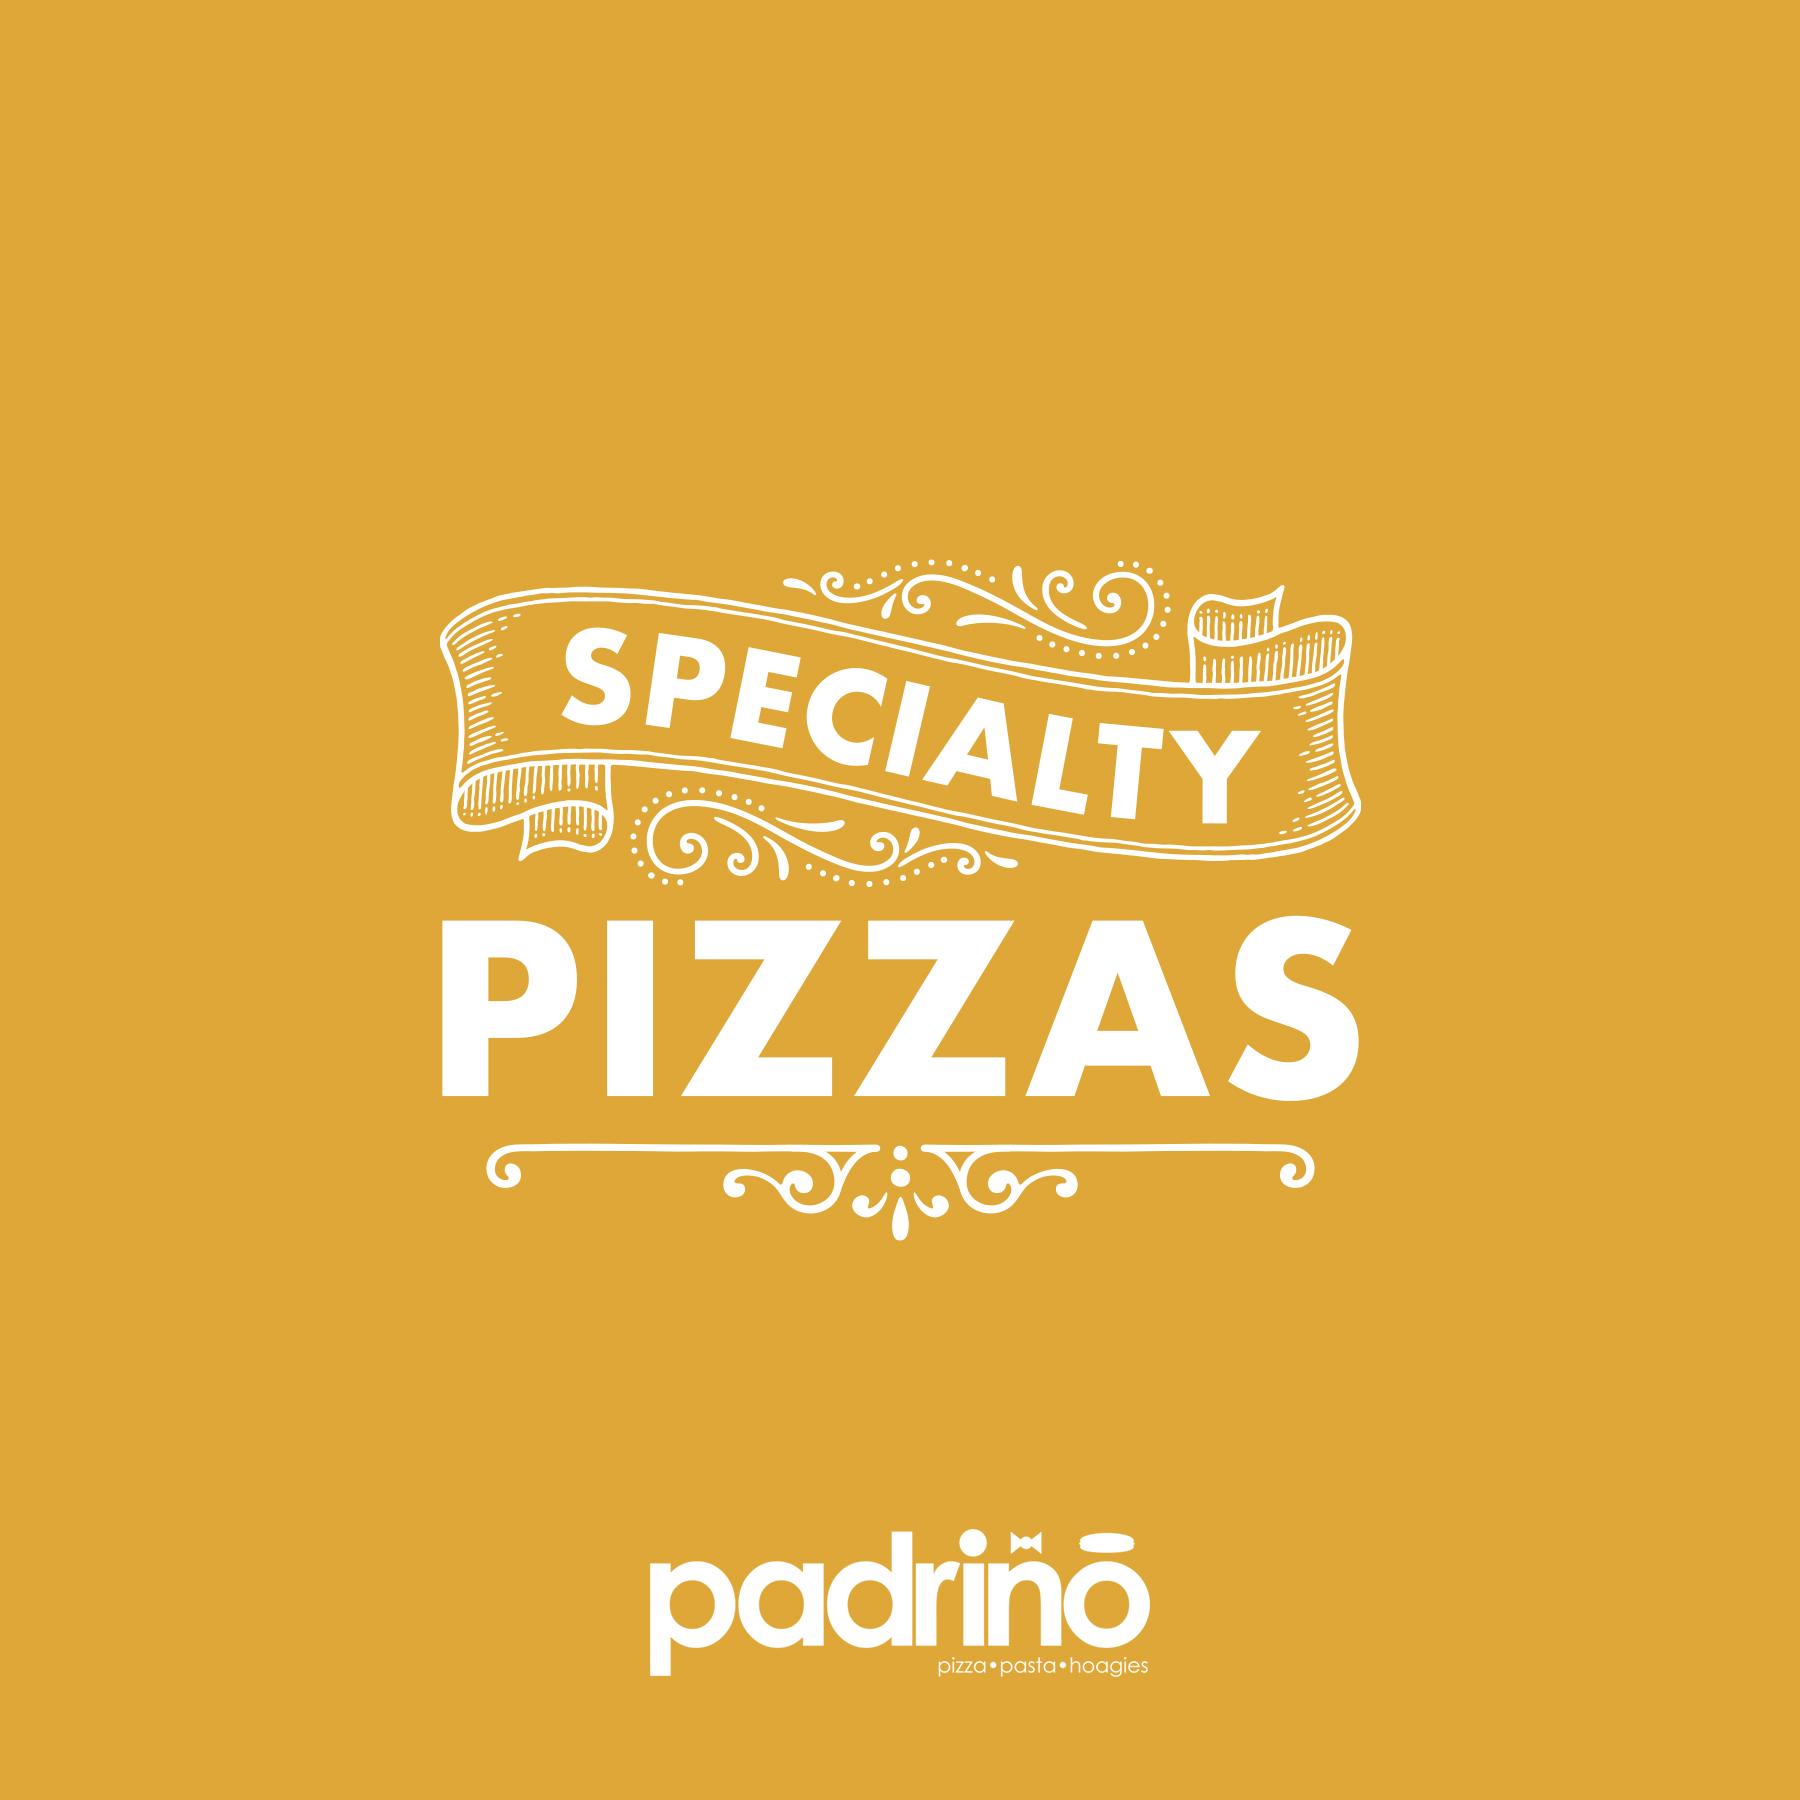 menu-elements-specialty-pizzas.jpg